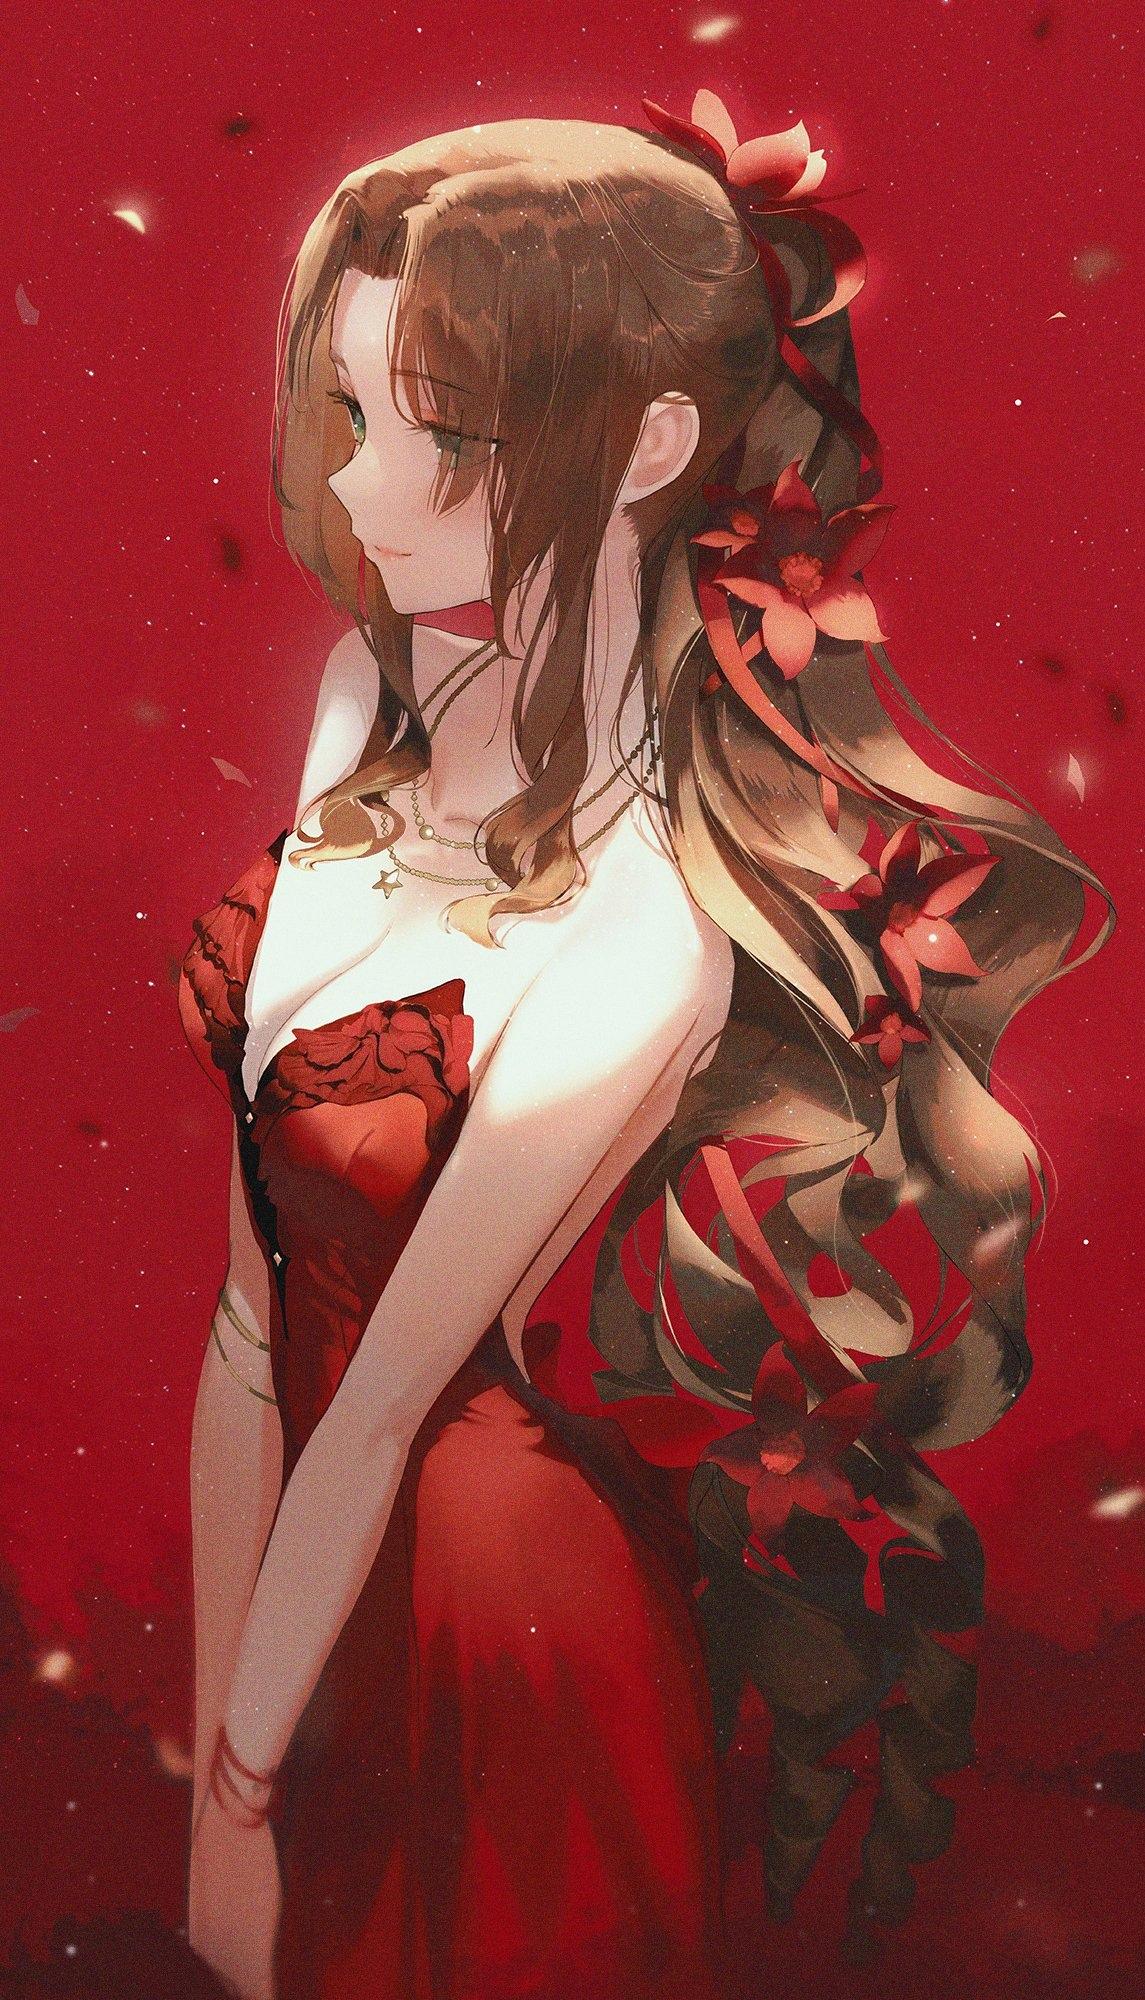 by sul - Final Fantasy 7